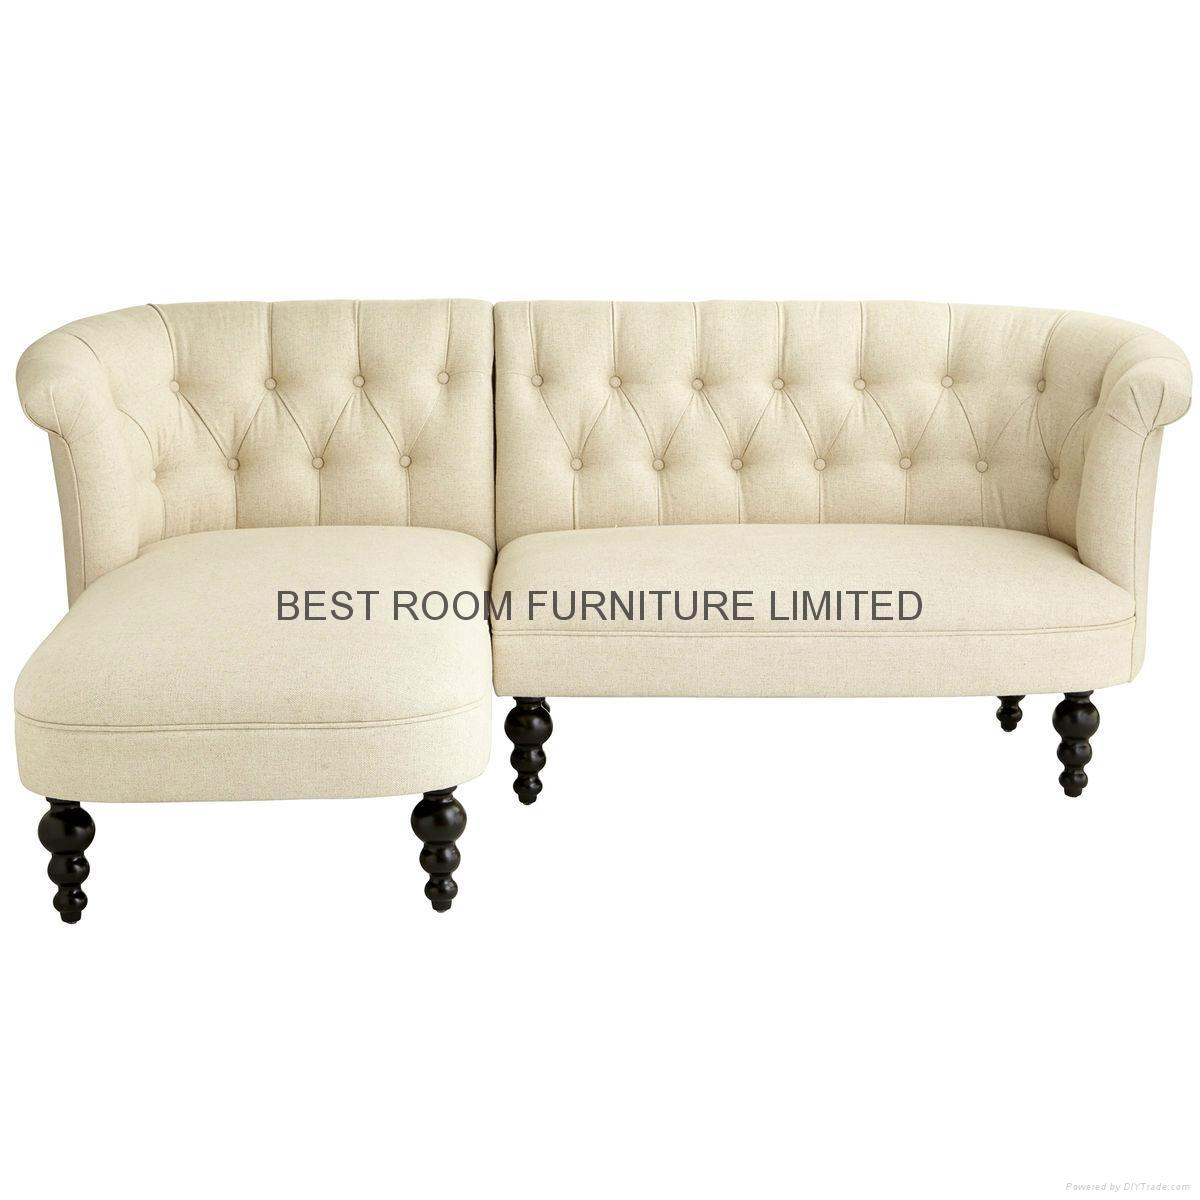 mordern liene  fabric tuffed hot-sold american furniture corner sofa with chaise 1